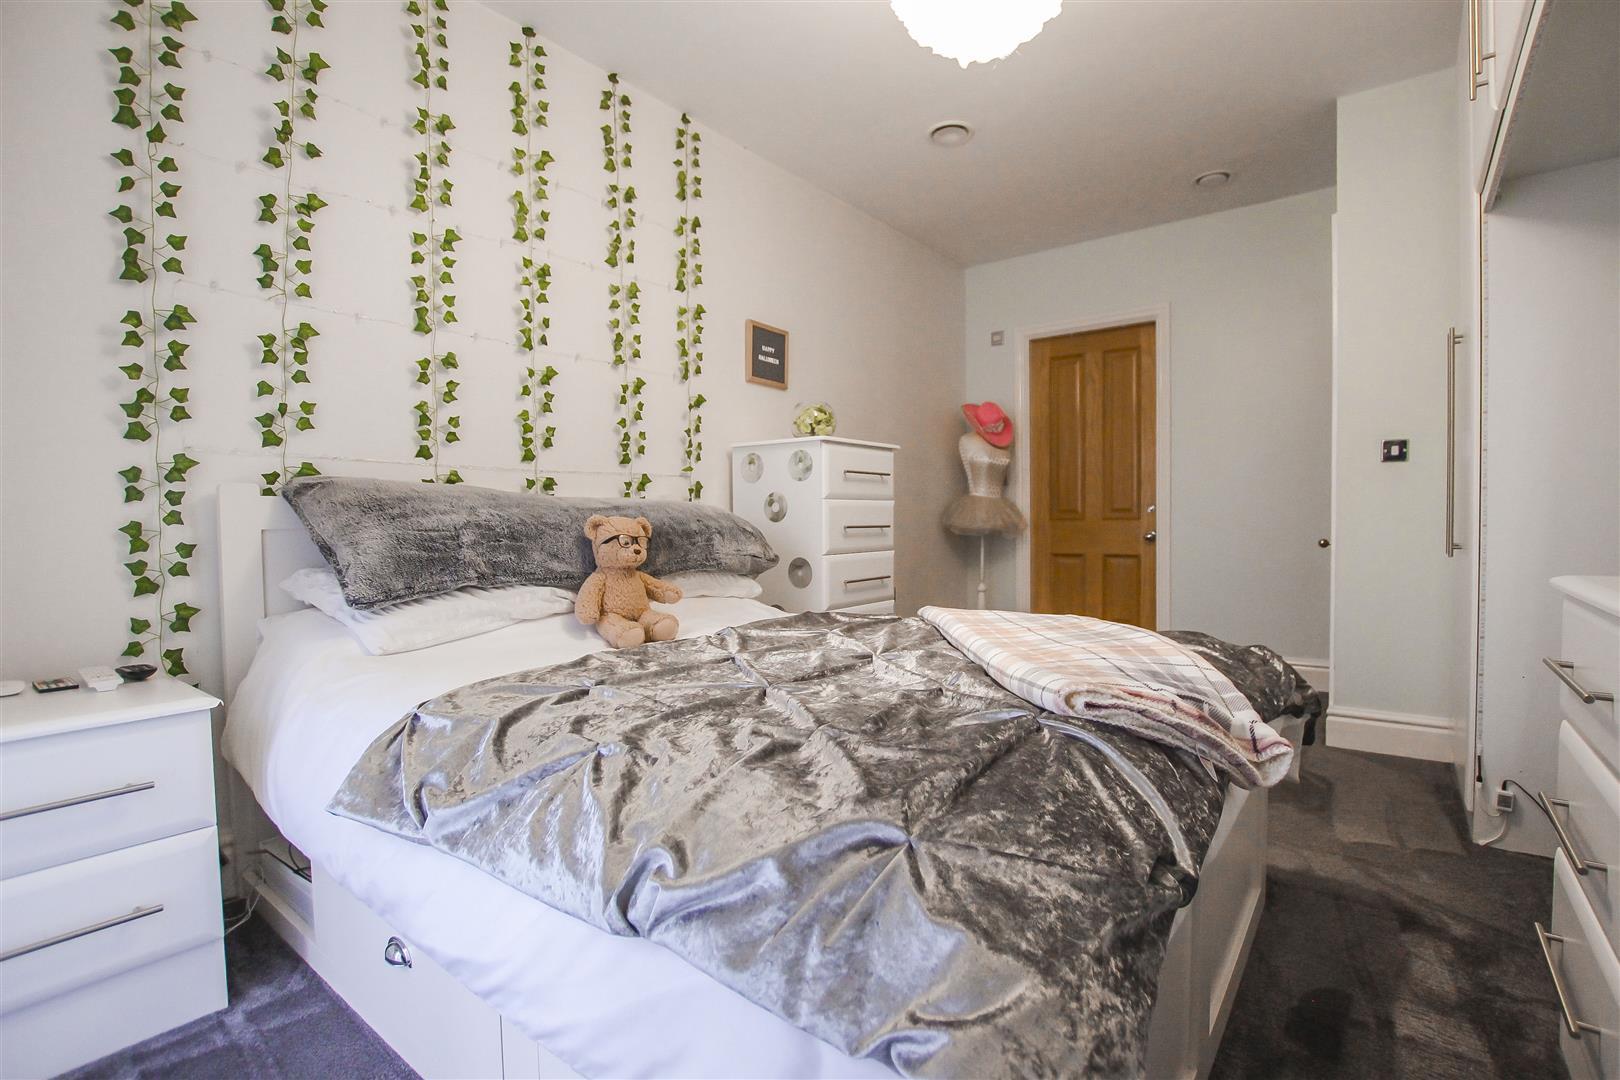 4 Bedroom Detached House For Sale - Bedroom 3